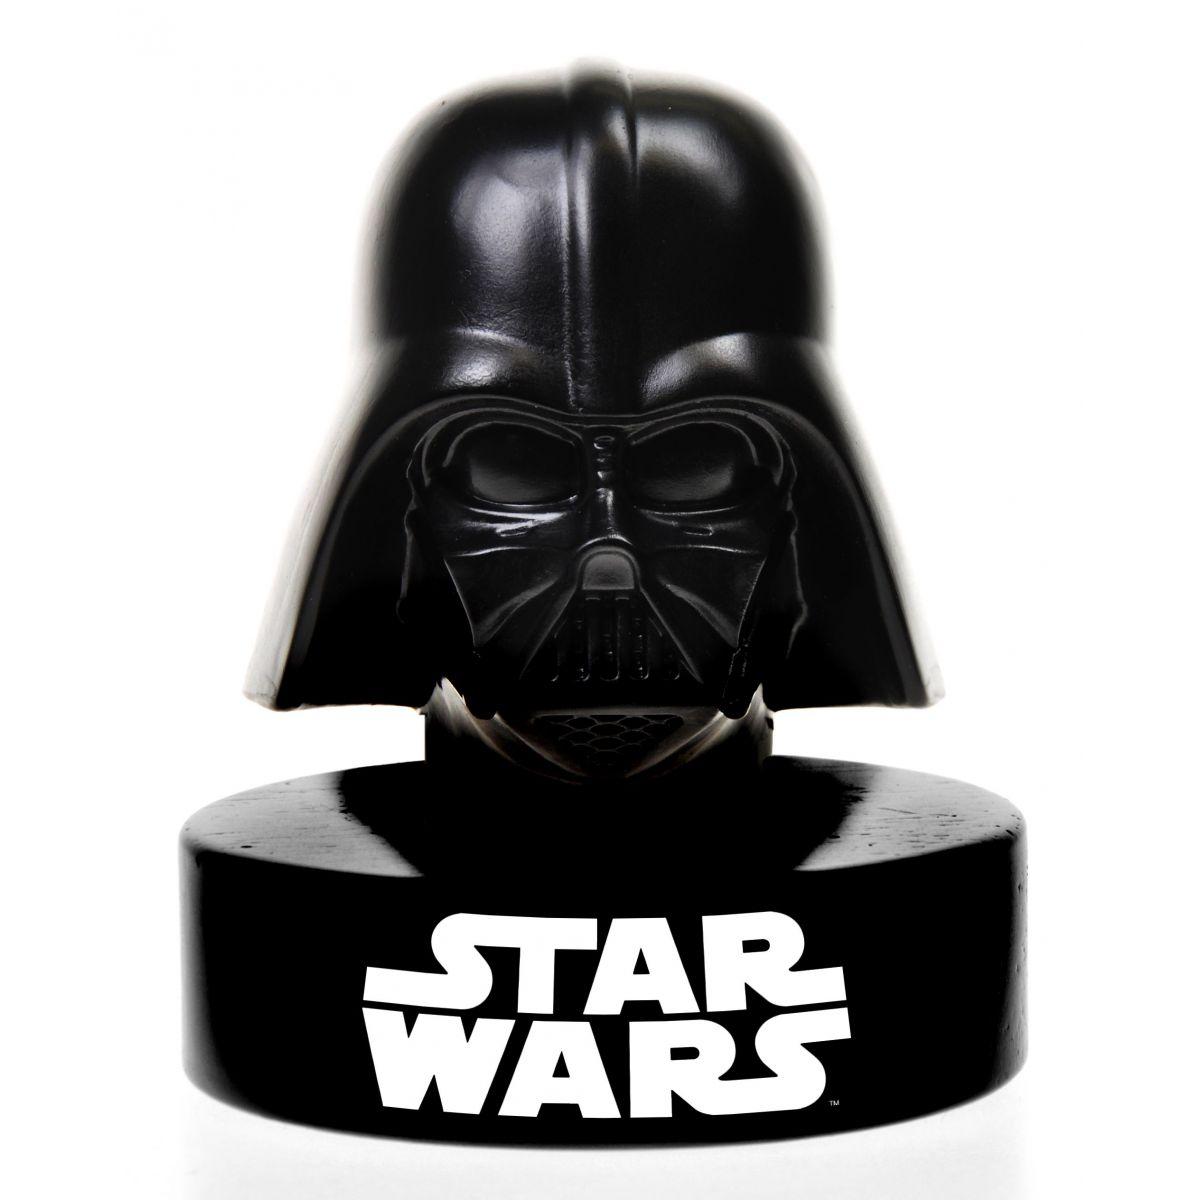 3D Star Wars sprchový gel 200ml Darth Vader